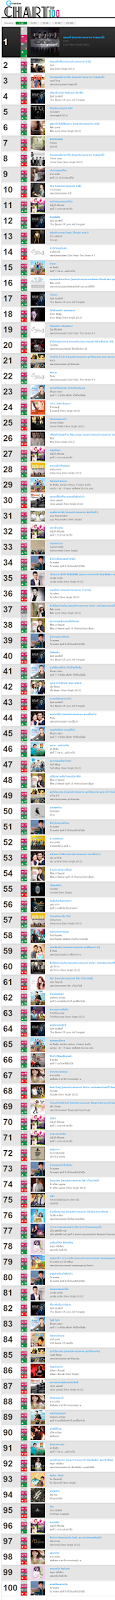 Download 100 อันดับ เพลงไทยที่เพราะและฮิตที่สุด จาก GMM Grammy [Hot New Official Chart] Gmember Chart Top 100 ประจำวันที่ 30 ธันวาคม 2556 [One2Up] 4shared By Pleng-mun.com